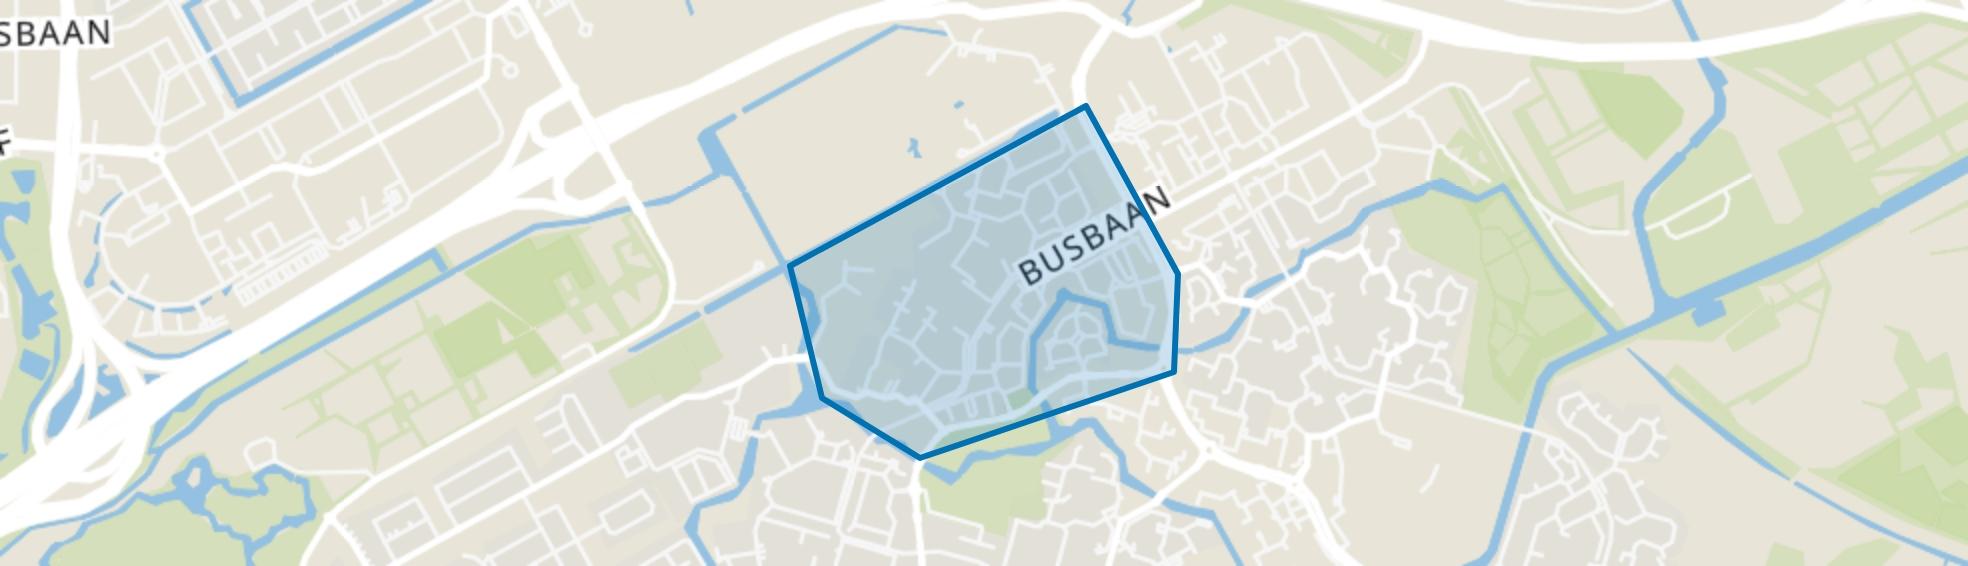 De Gouwen, Almere map